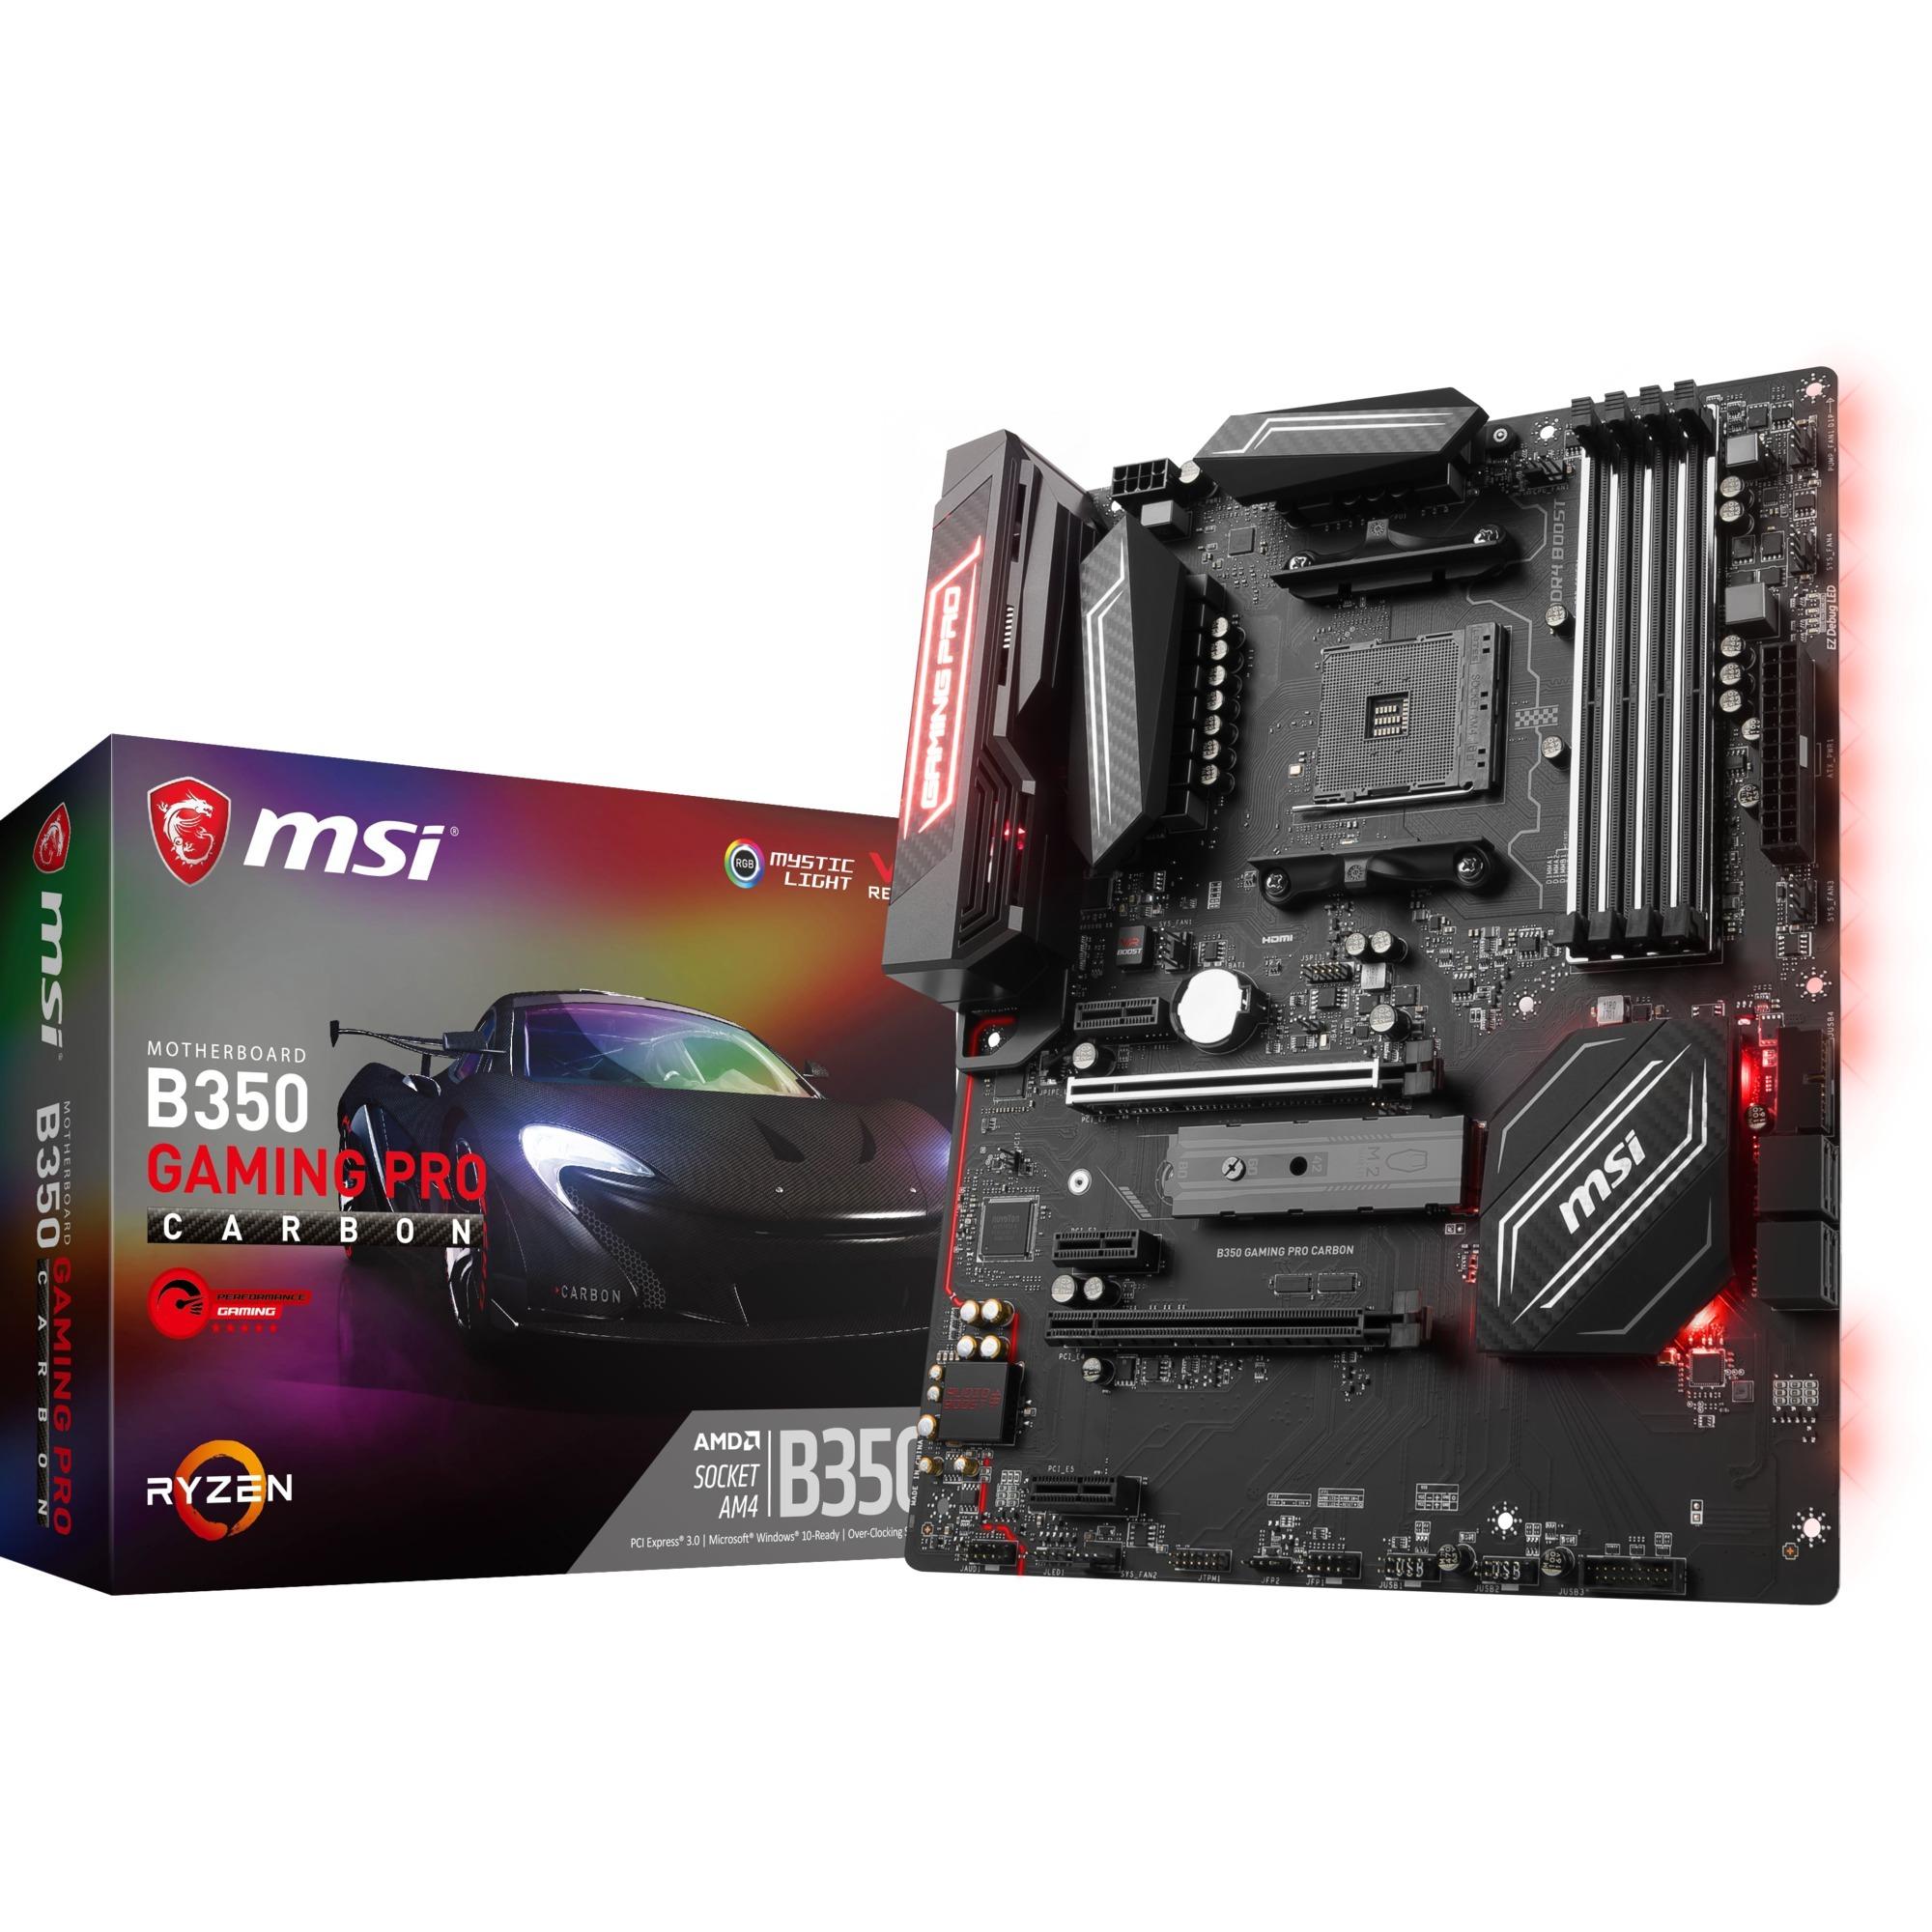 B350 GAMING PRO CARBON AMD B350 Socket AM4 ATX carte mère